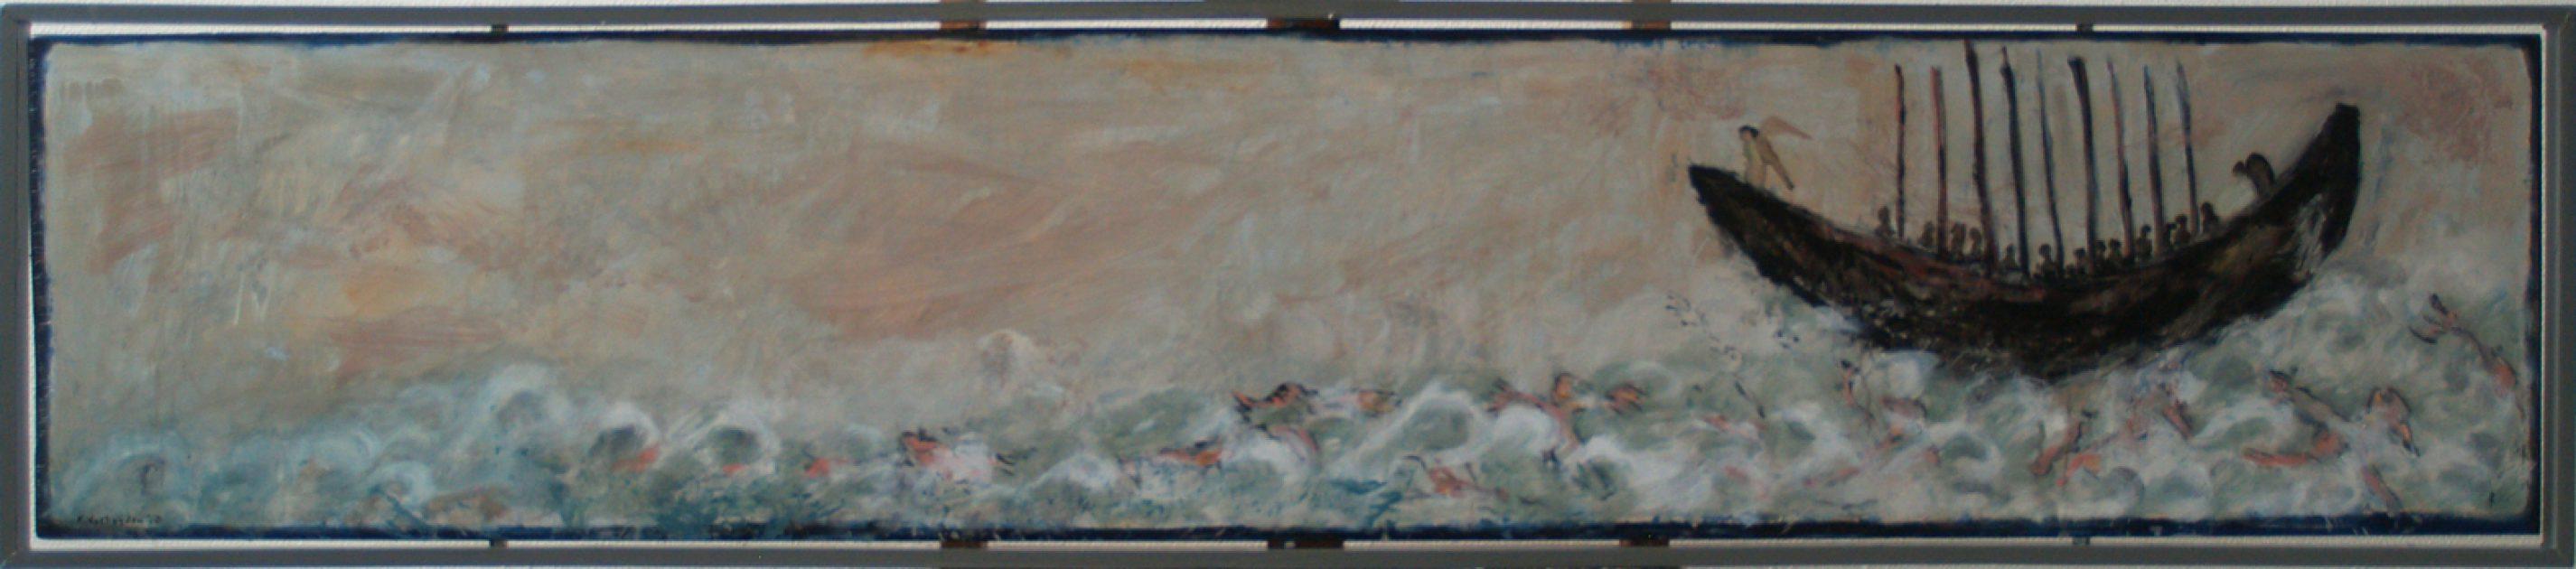 """Styx"" uit de serie: ""Ars Moriendi 2"" - olie/paneel  44x205,5 cm. 2017"